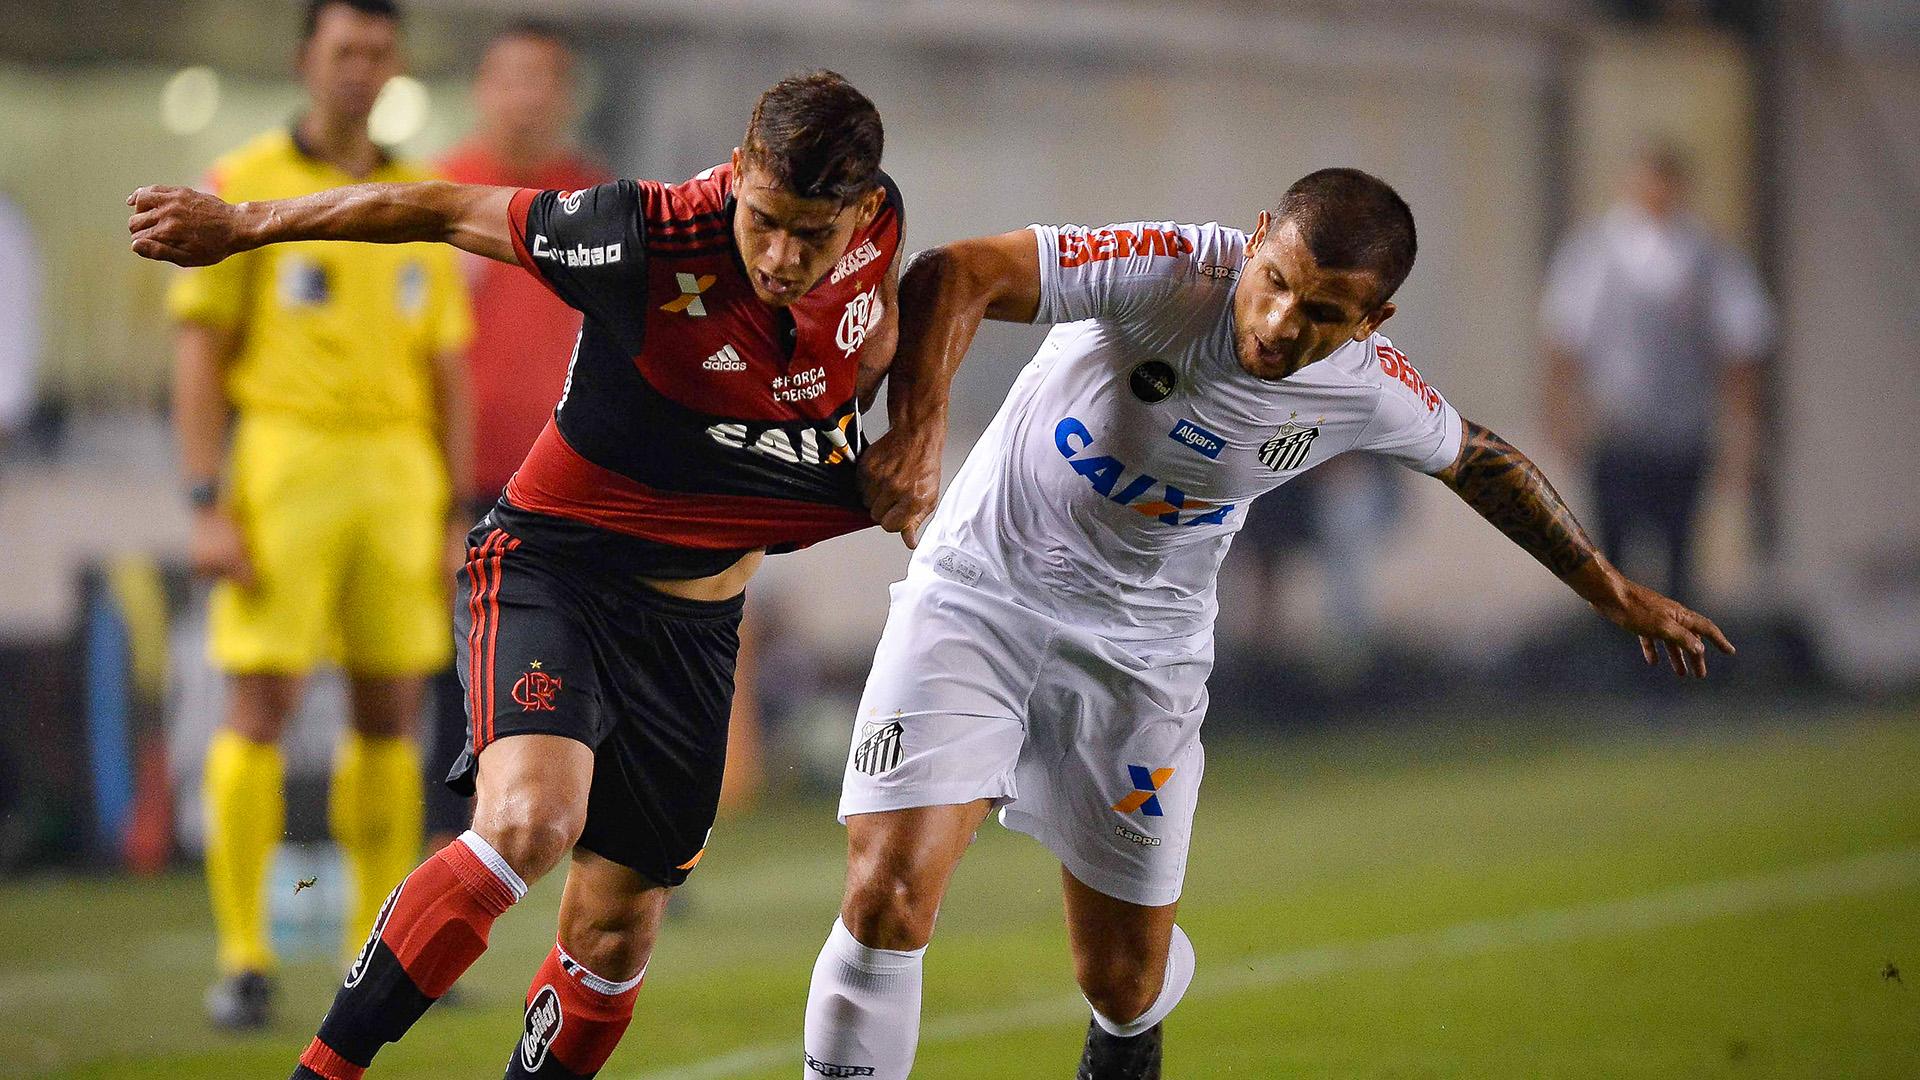 Gustavo Cuellar Emiliano Vecchio Santos Flamengo Copa do Brasil 26072017